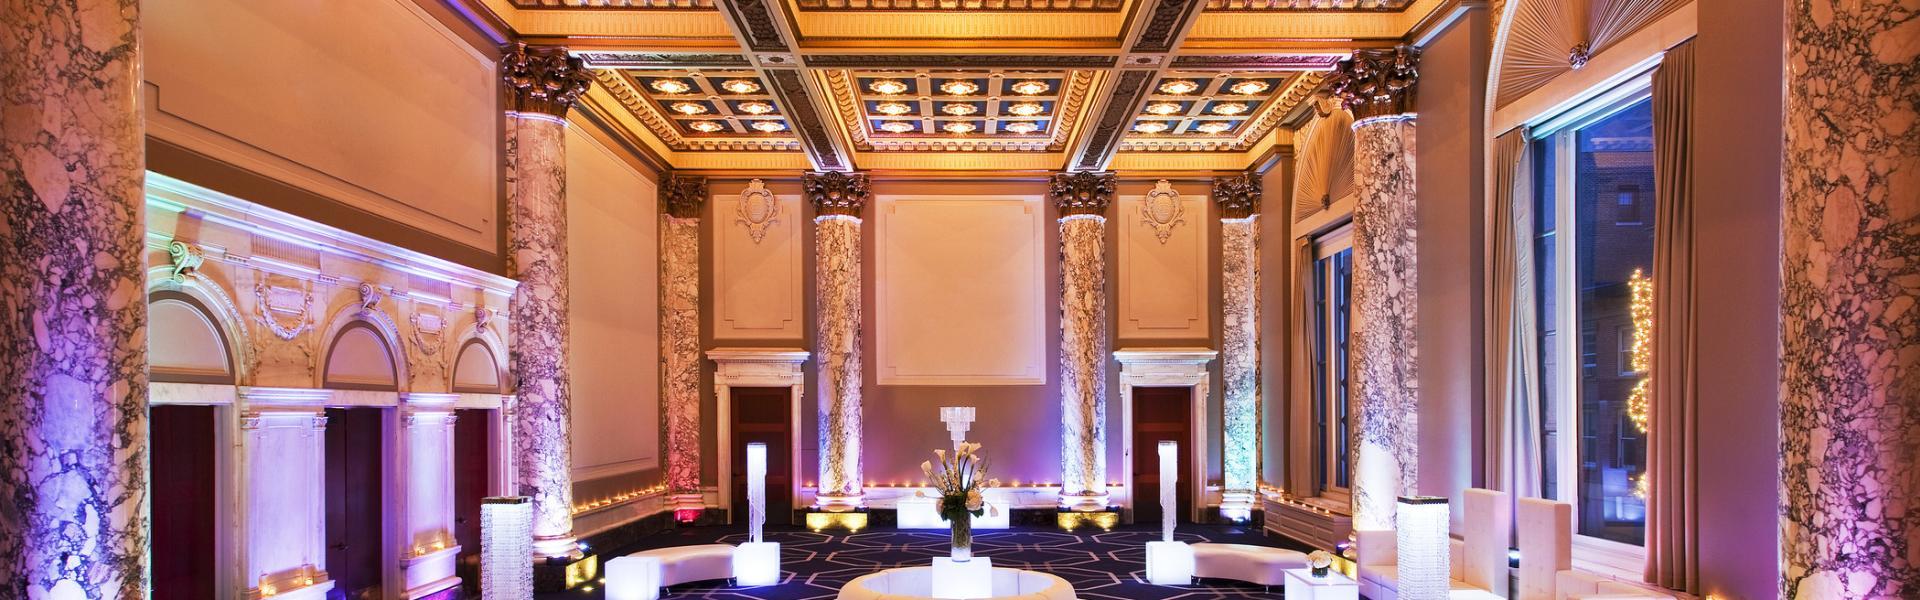 W New York Hotel, Union Square, Ballroom